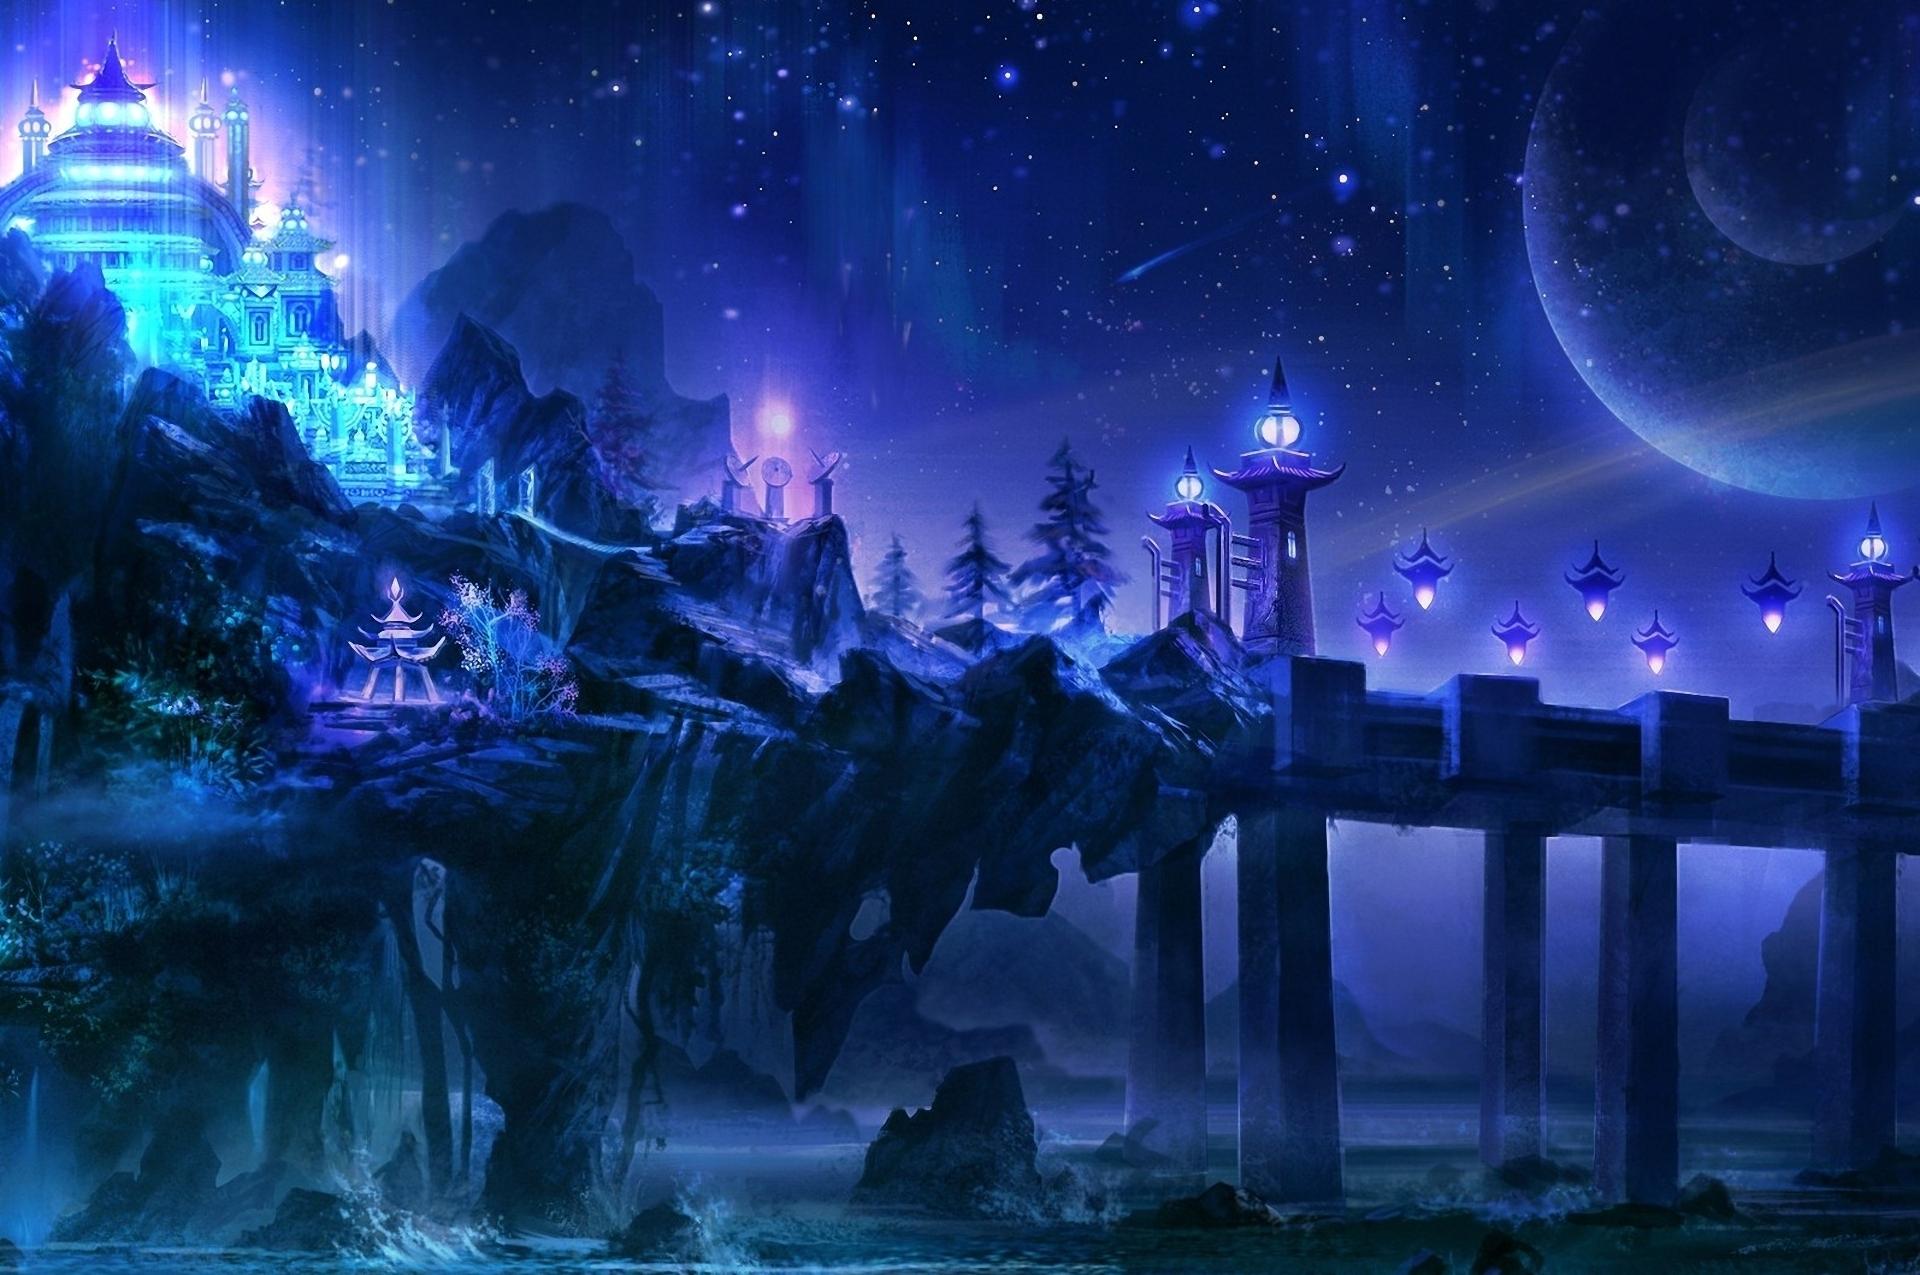 Image: Castle, building, rocks, bridge, lanterns, lights, night, stars